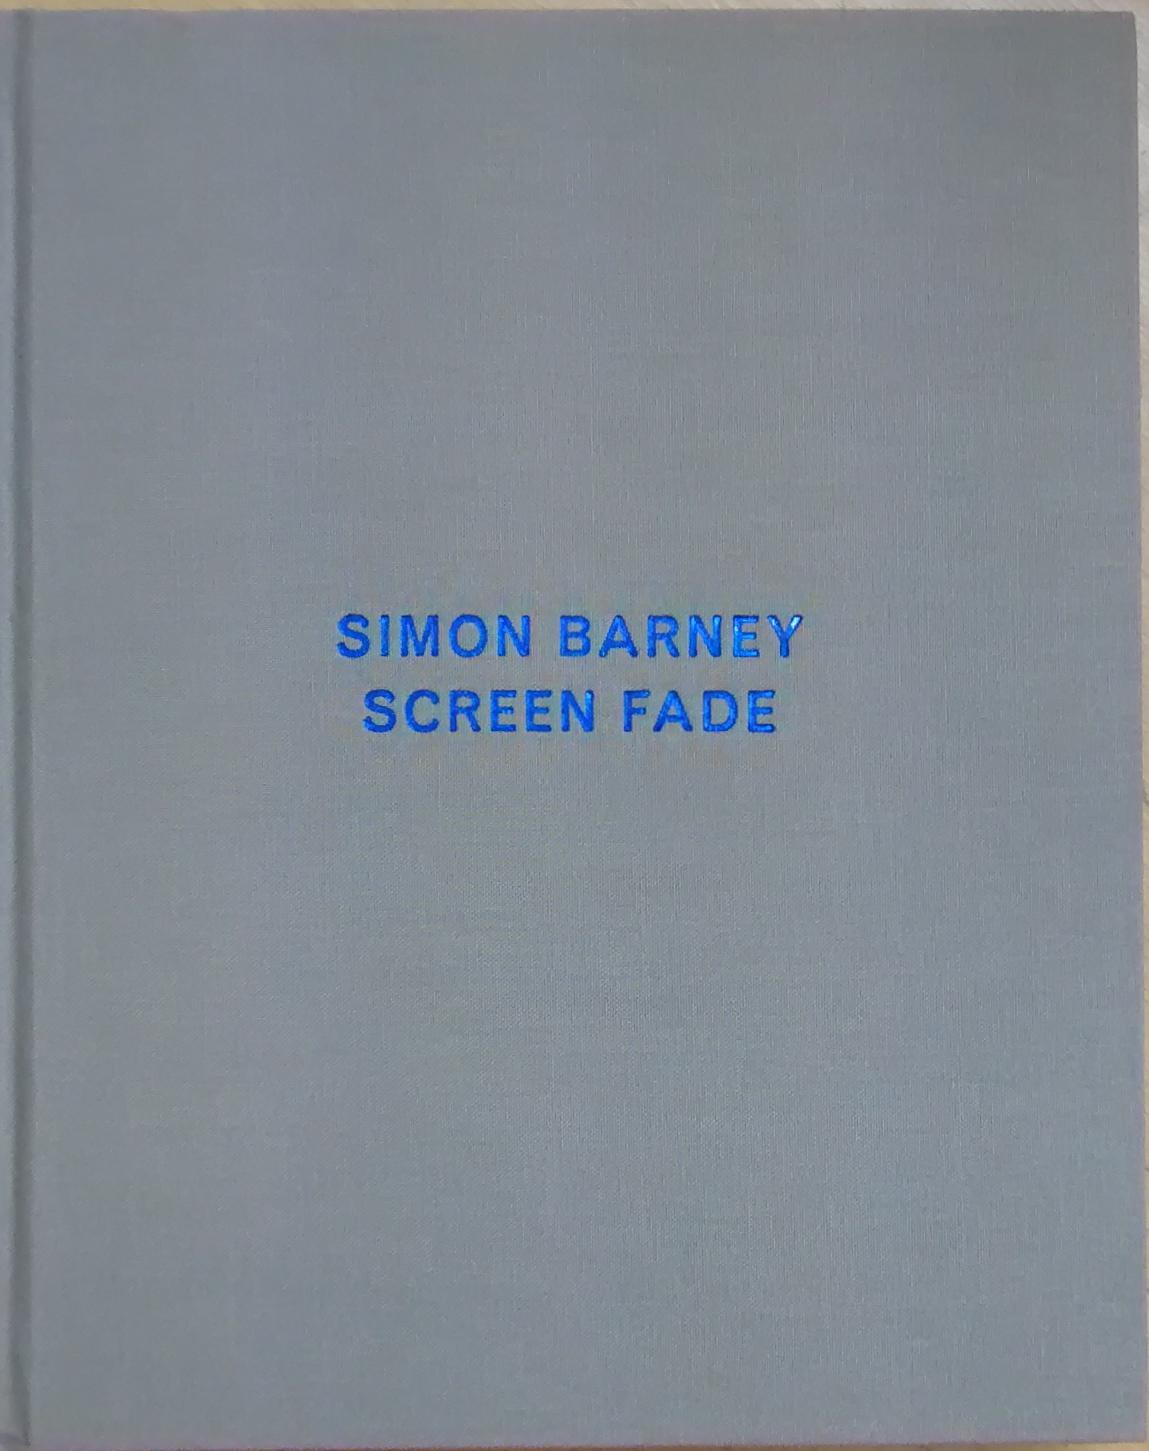 Screen Fade